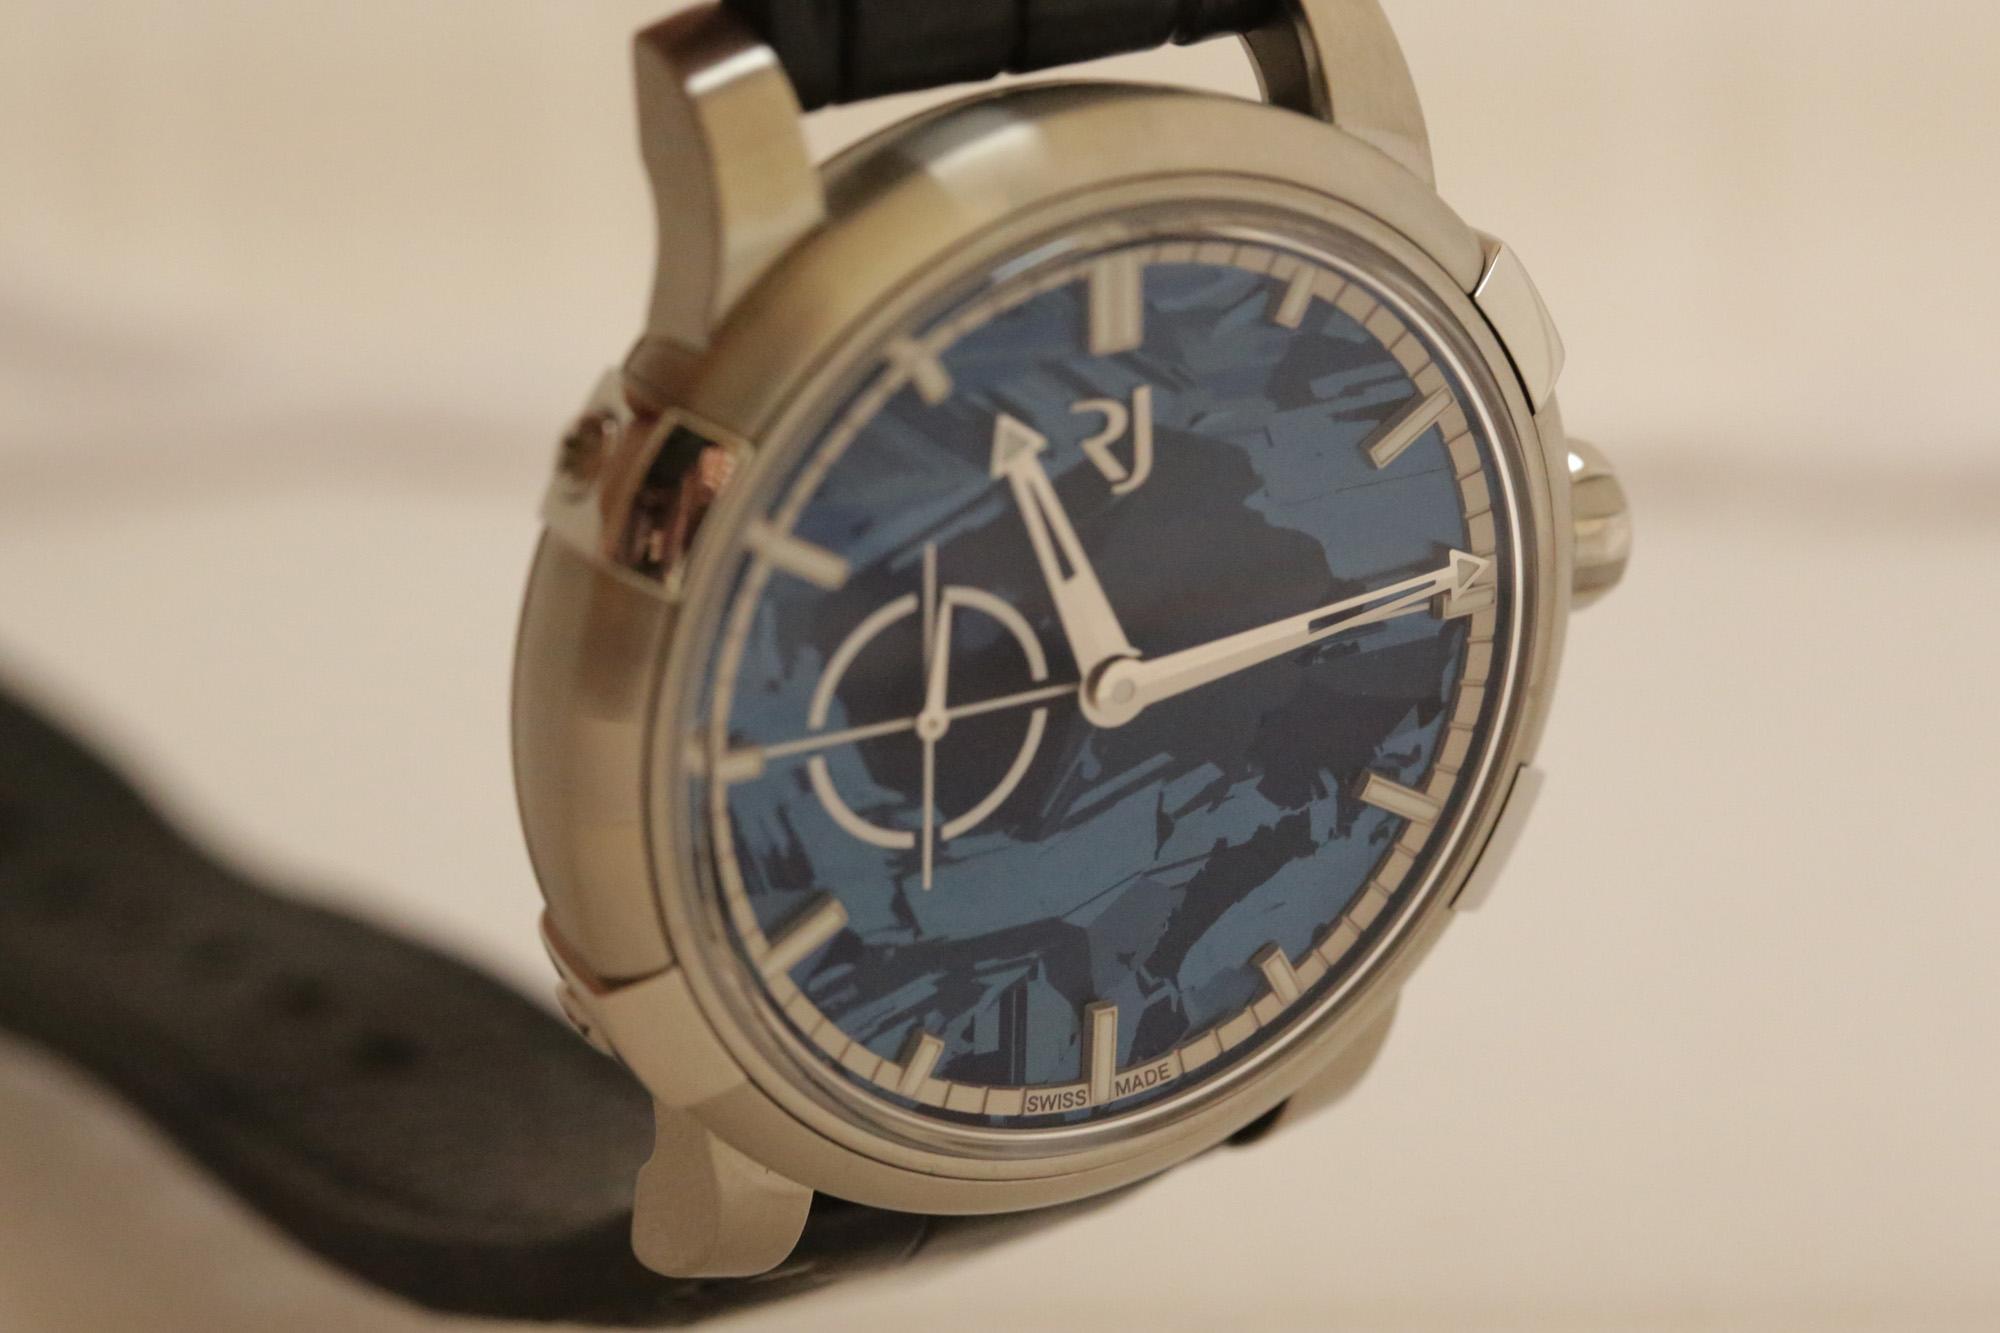 RJ-Romain Jerome 1969 Heavy Metal Blue Silicium - Dial